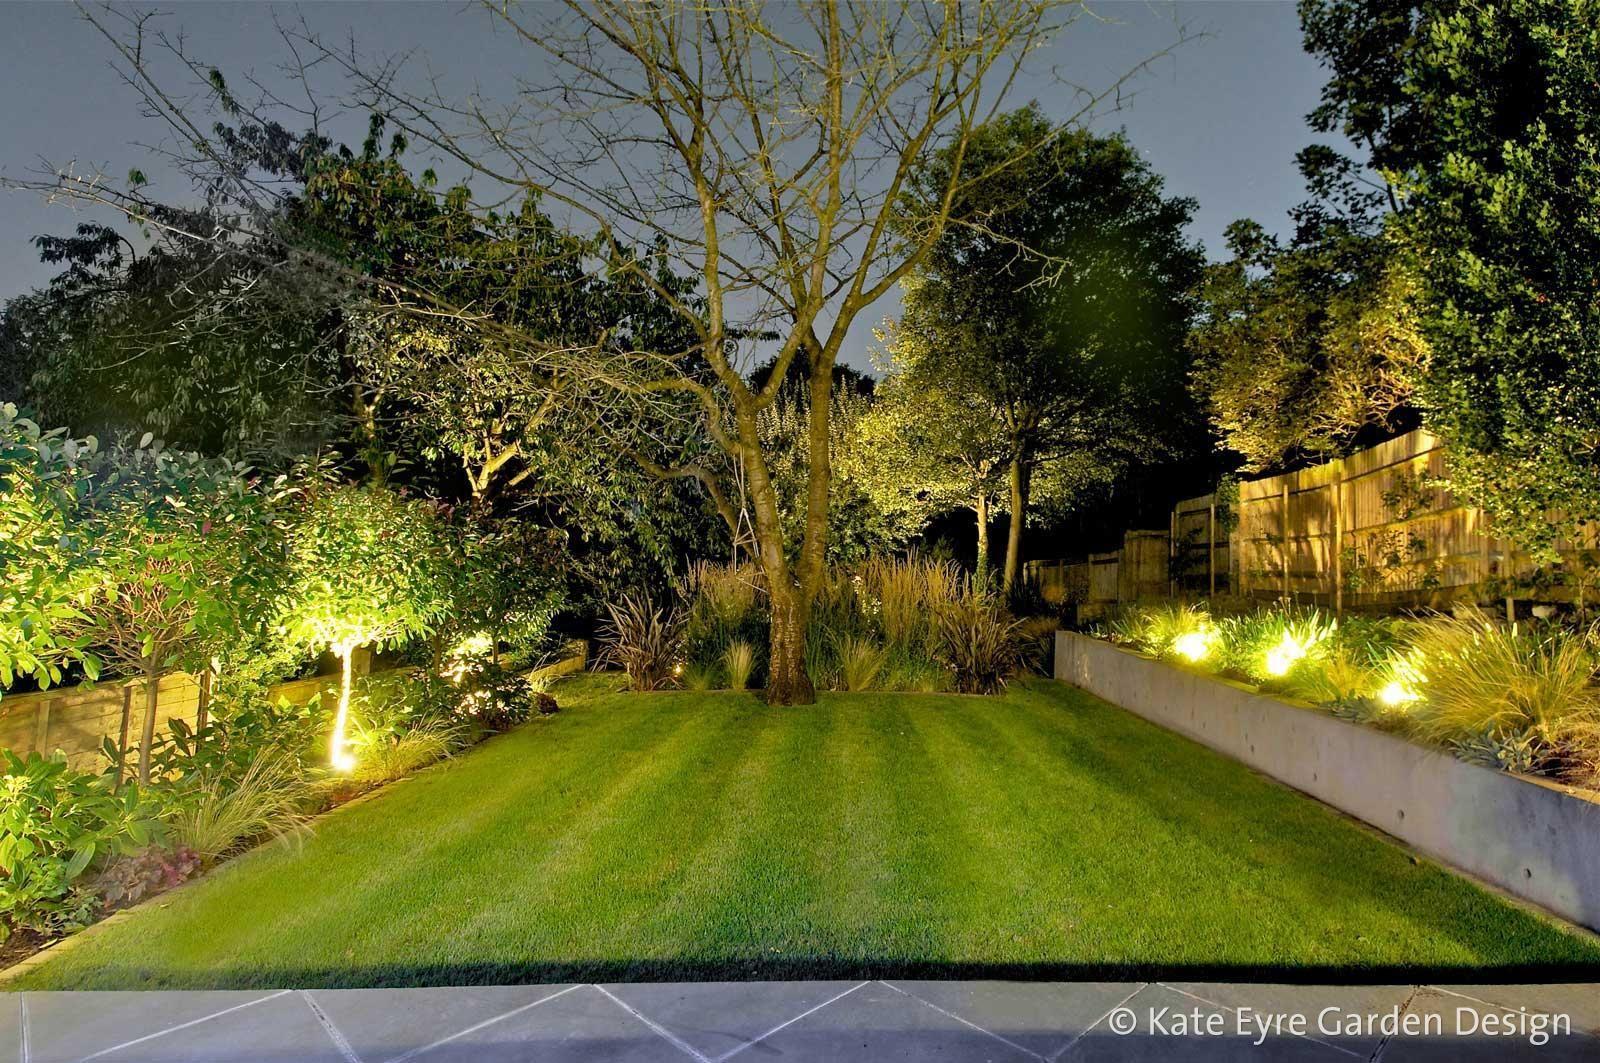 Large Gardens In London Kate Eyre Garden Design Garden Lighting Design Outside Garden Lights Garden Design